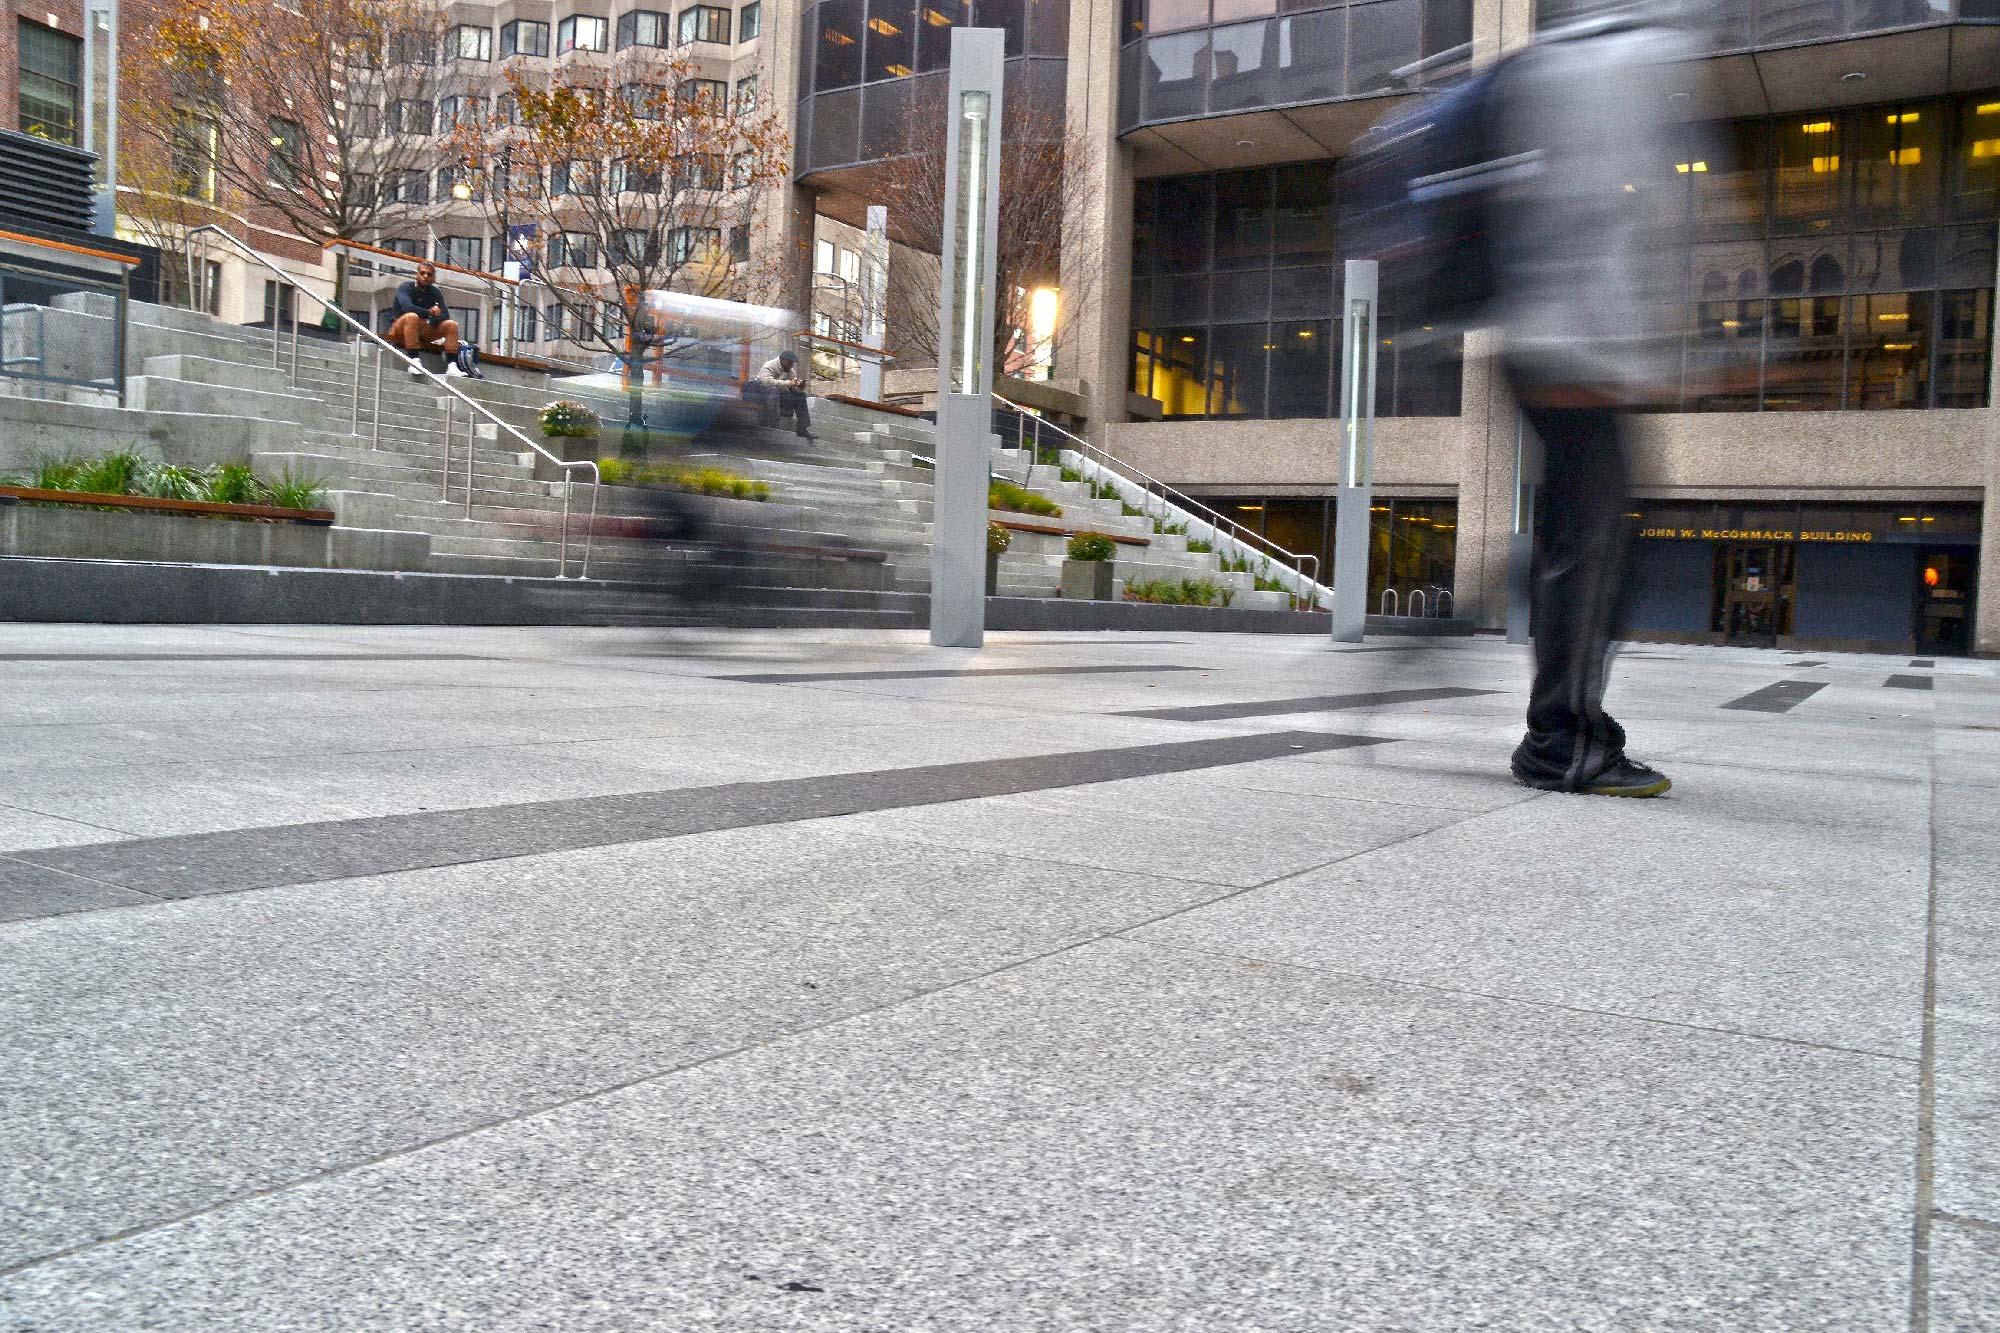 Klopfer-Martin-Design-Group-Suffolk-Roemer-Plaza-01.jpg